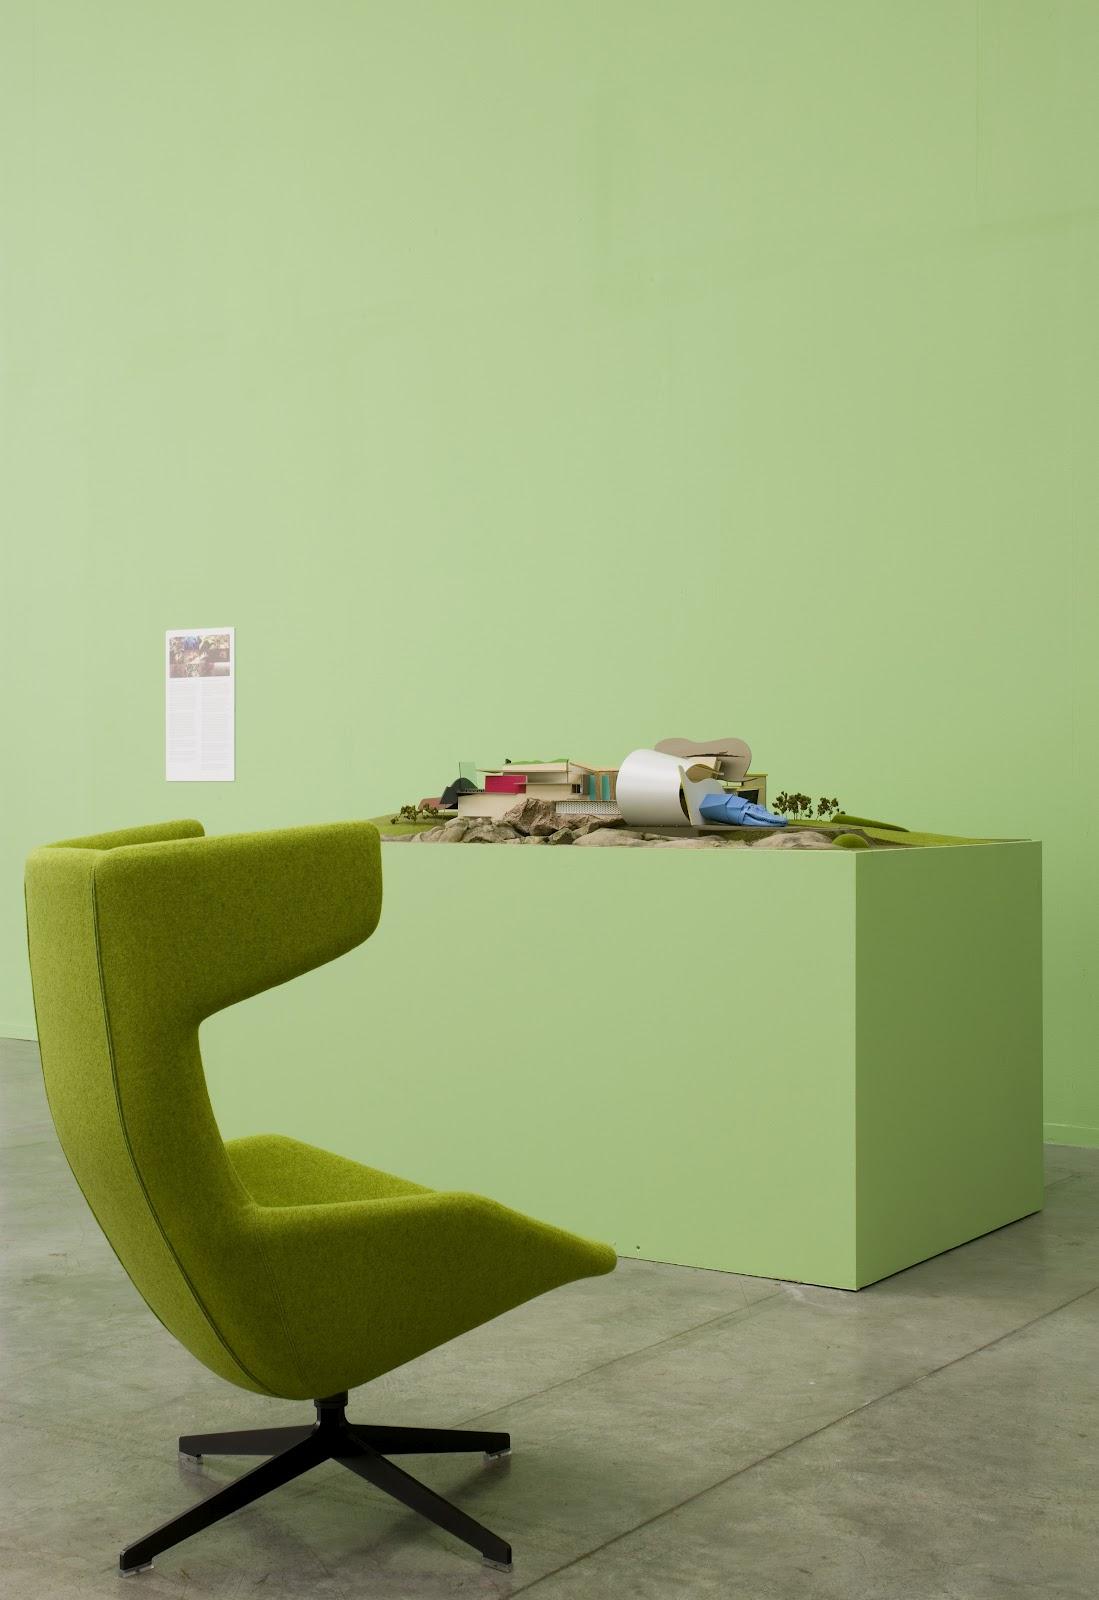 Monet's Piranha Soup 6 (Crocodilia construct and chair).jpg